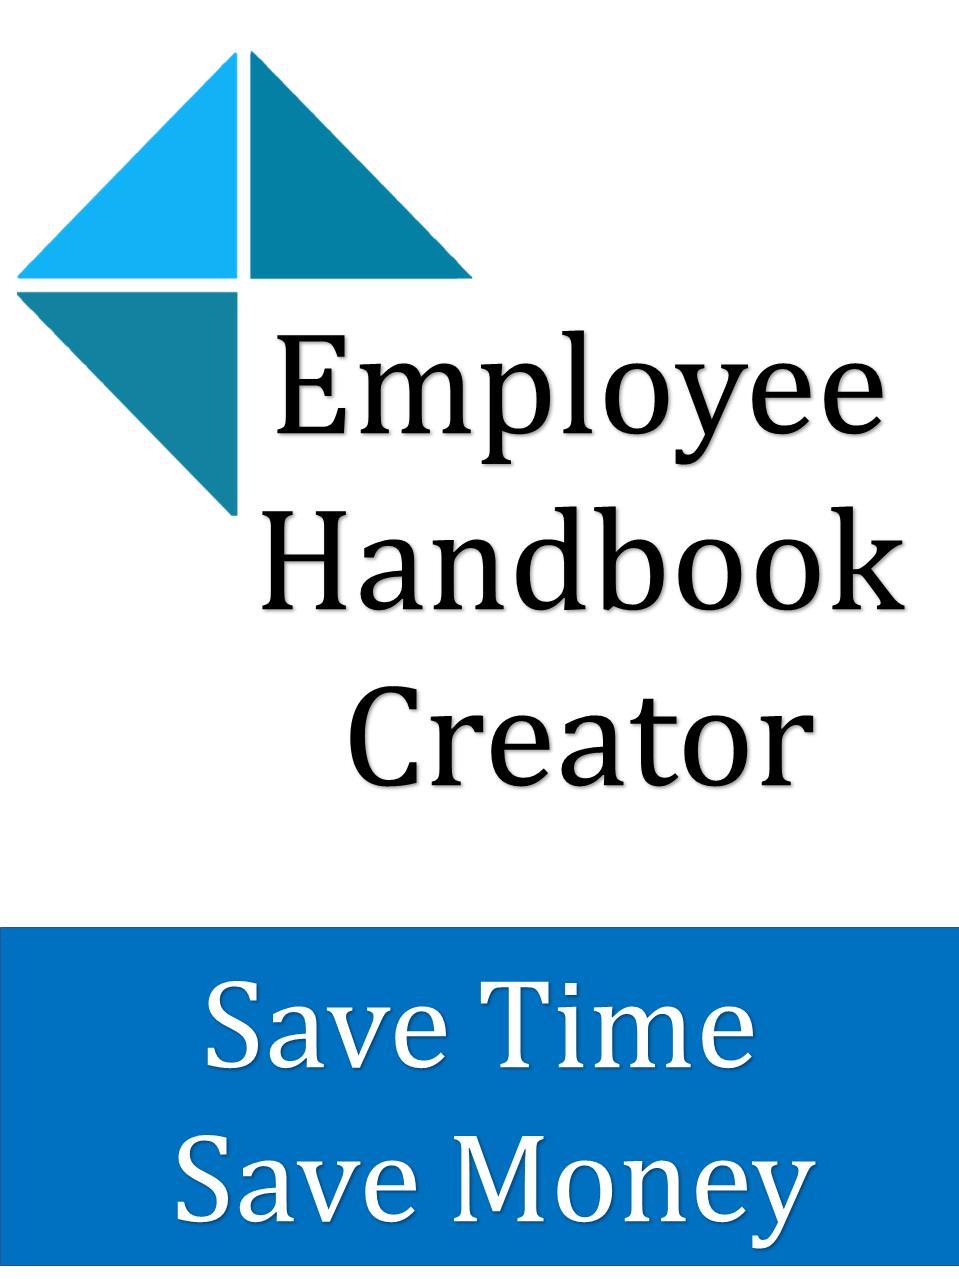 Employee Handbook Creator